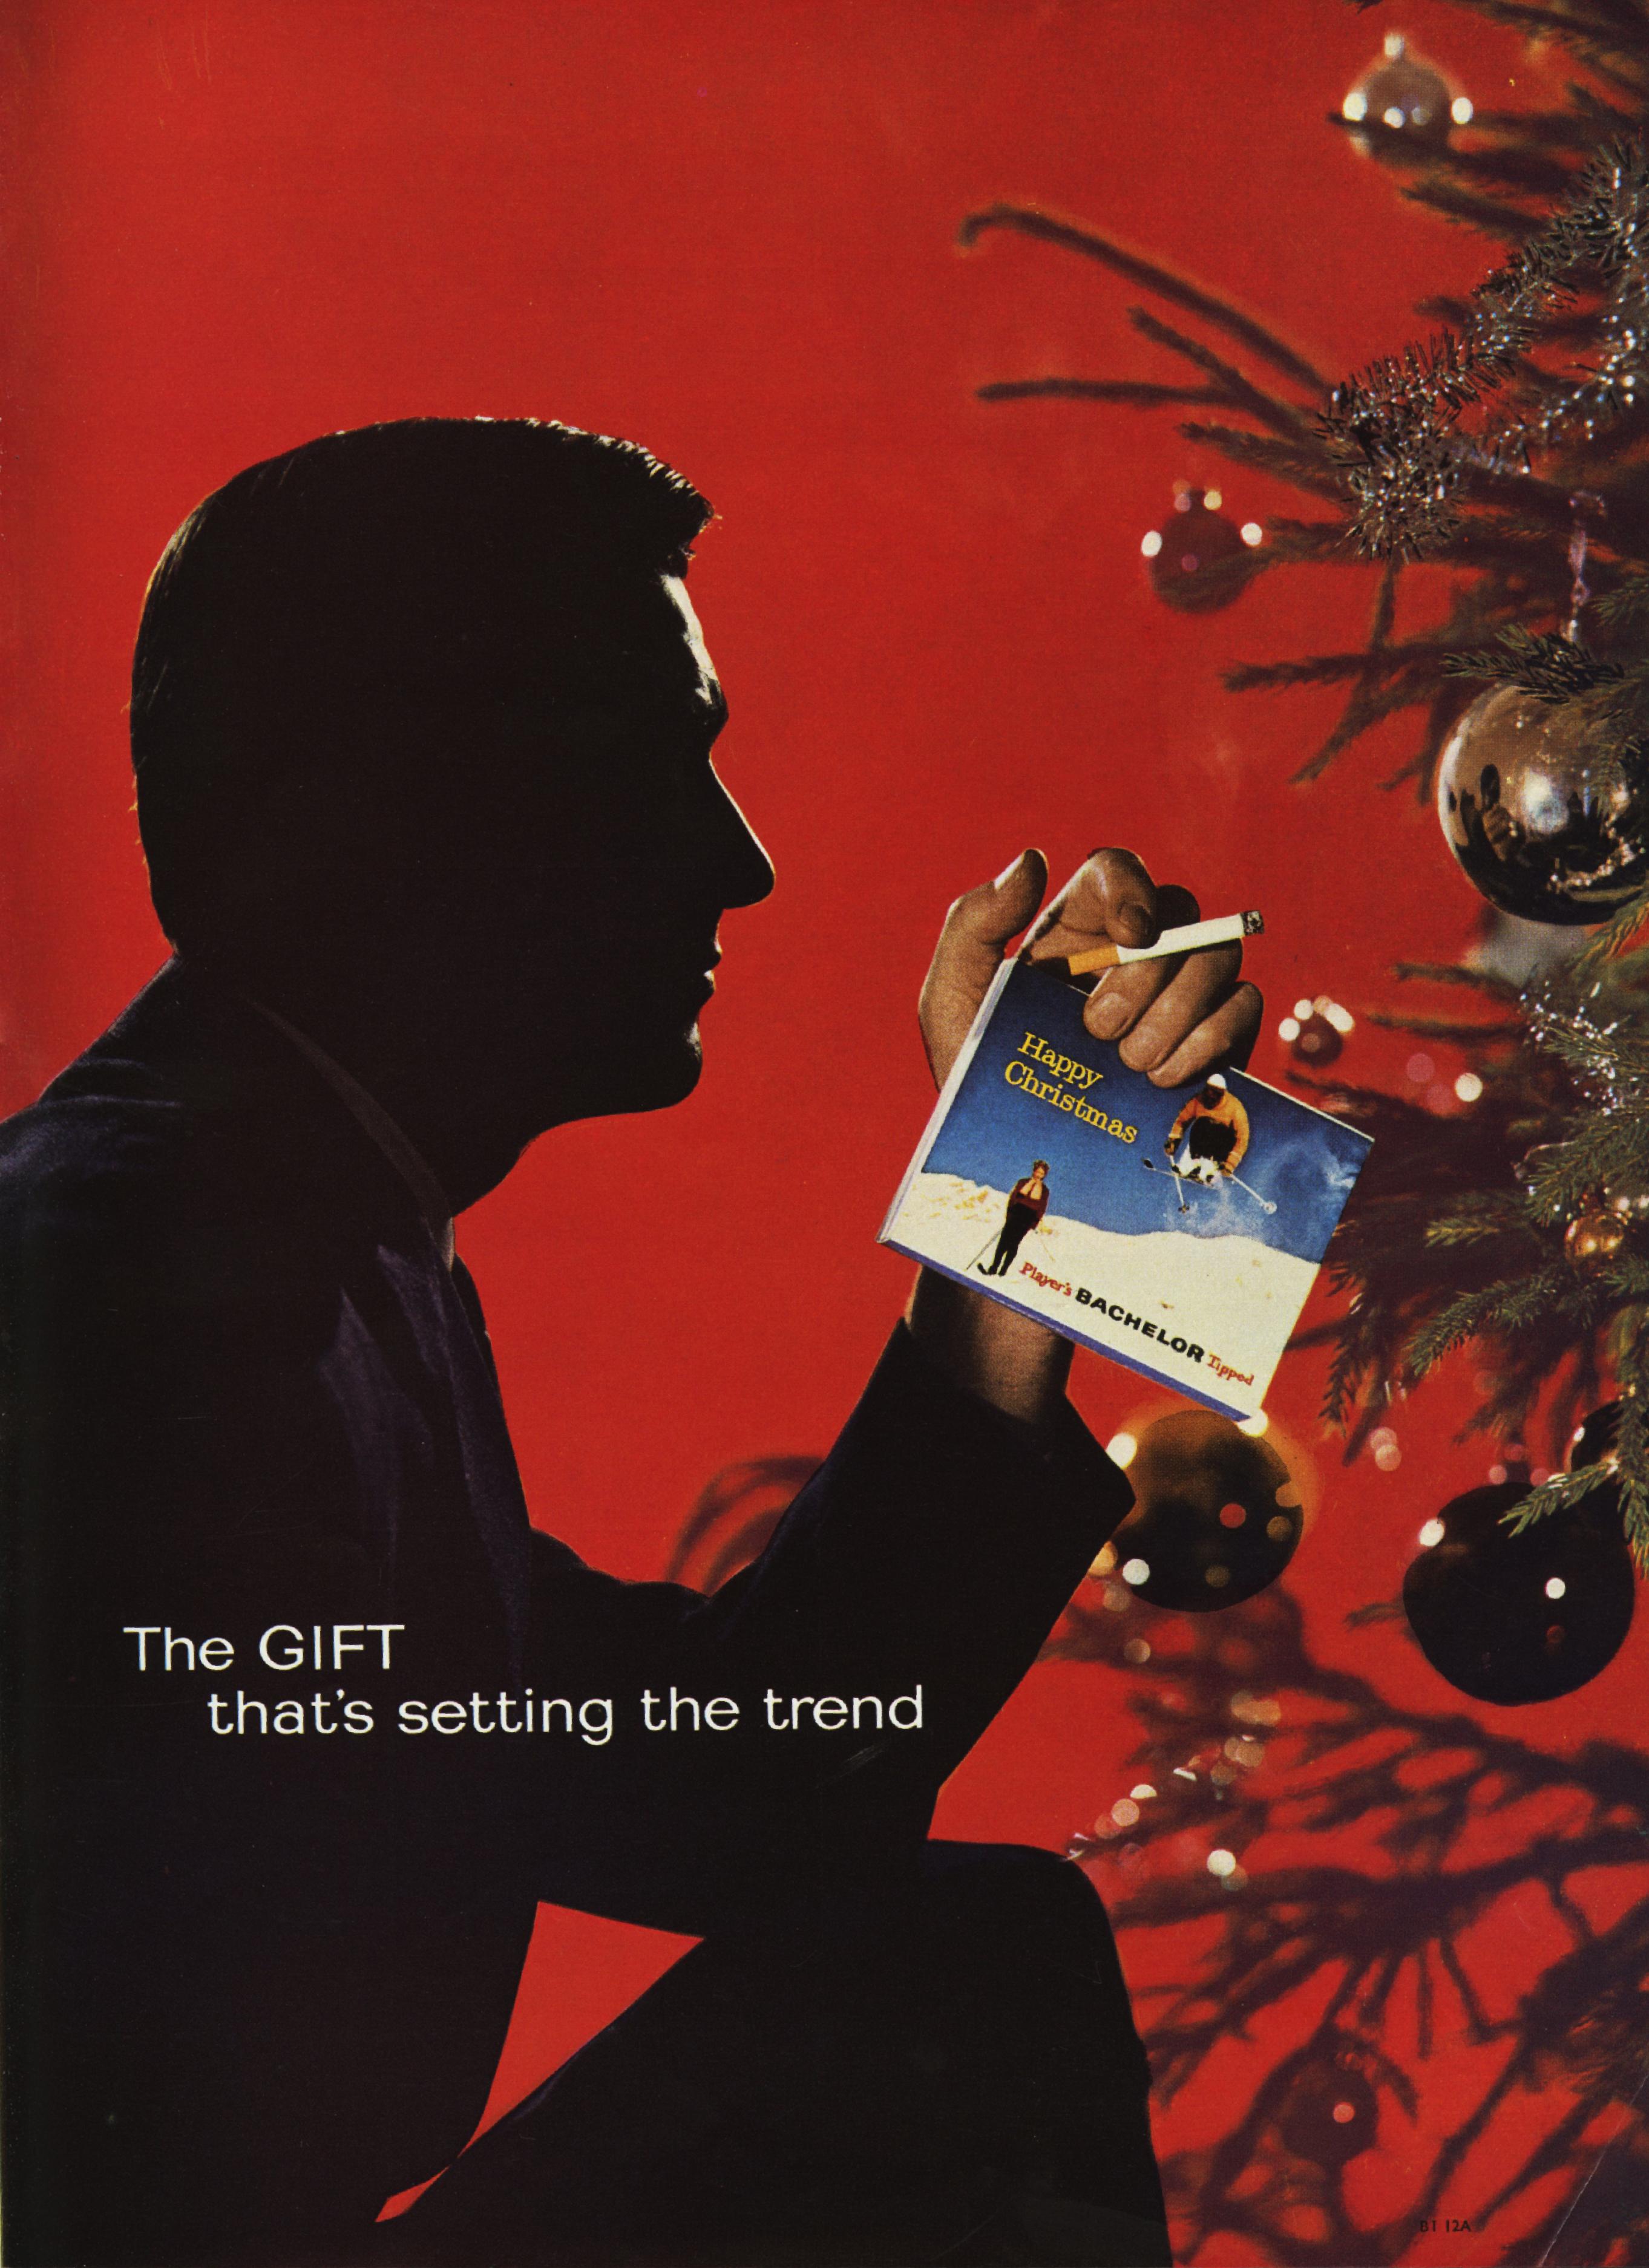 Lester Bookbinder, Bachelors Cigarettes - 'Christmas Tree'-01